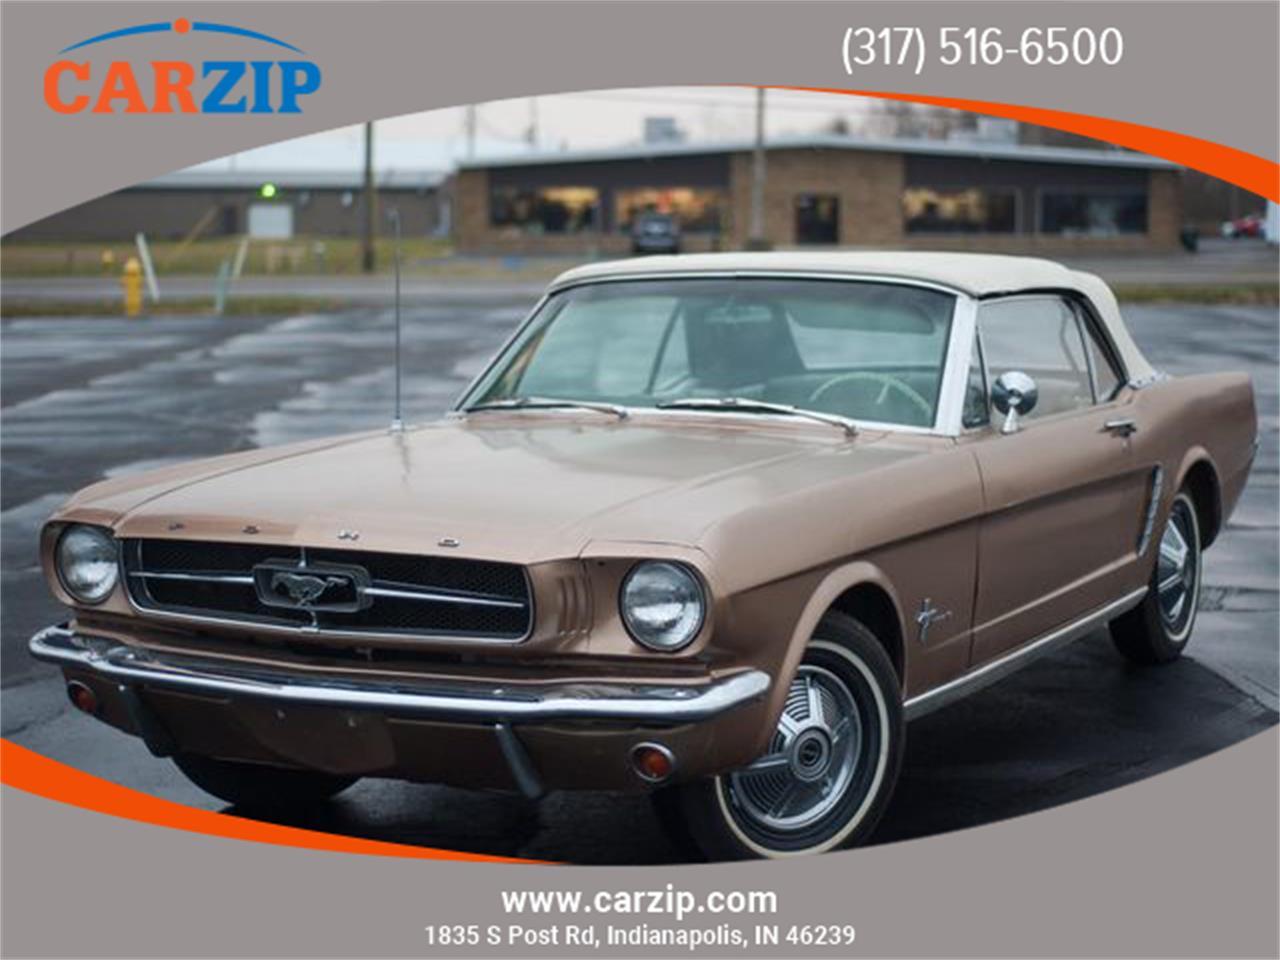 Ford Mustang Cabriolet 1965 prix tout compris 1965